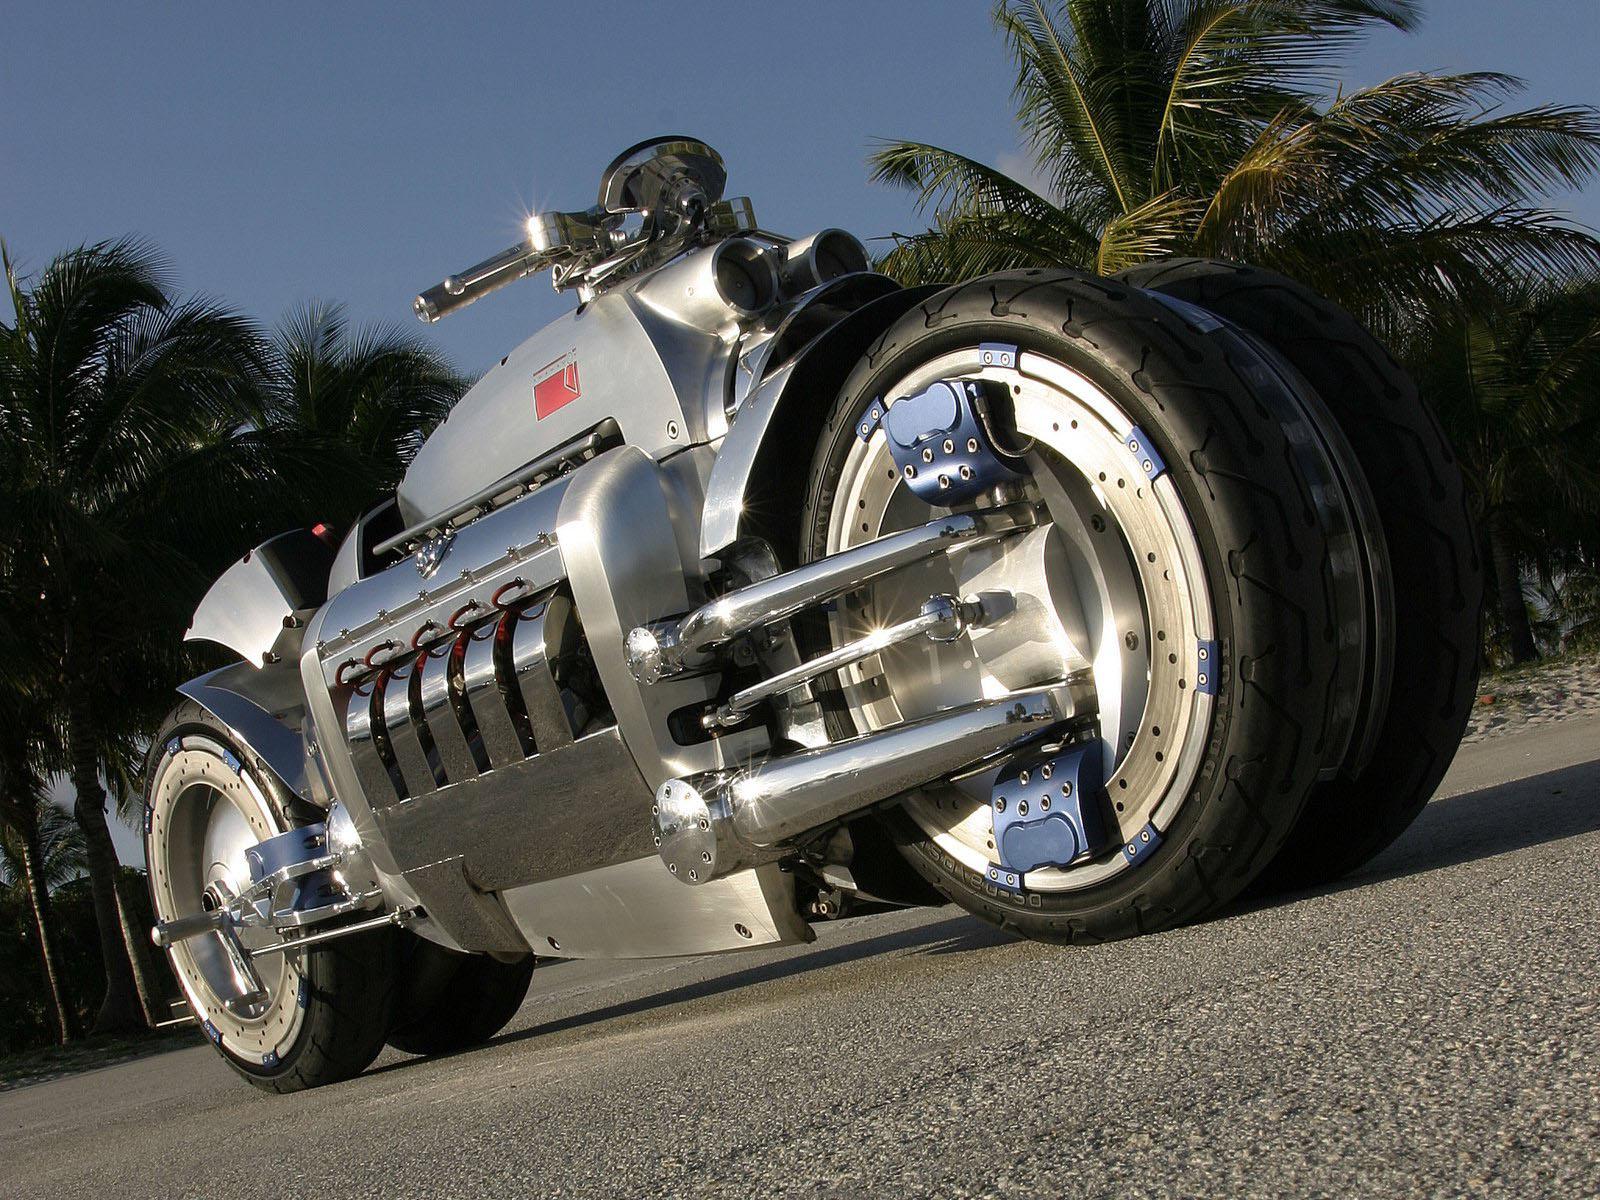 HDoboi.Kiev.ua - Мотоцикл Dodge Tomahawk Concept, вид снизу